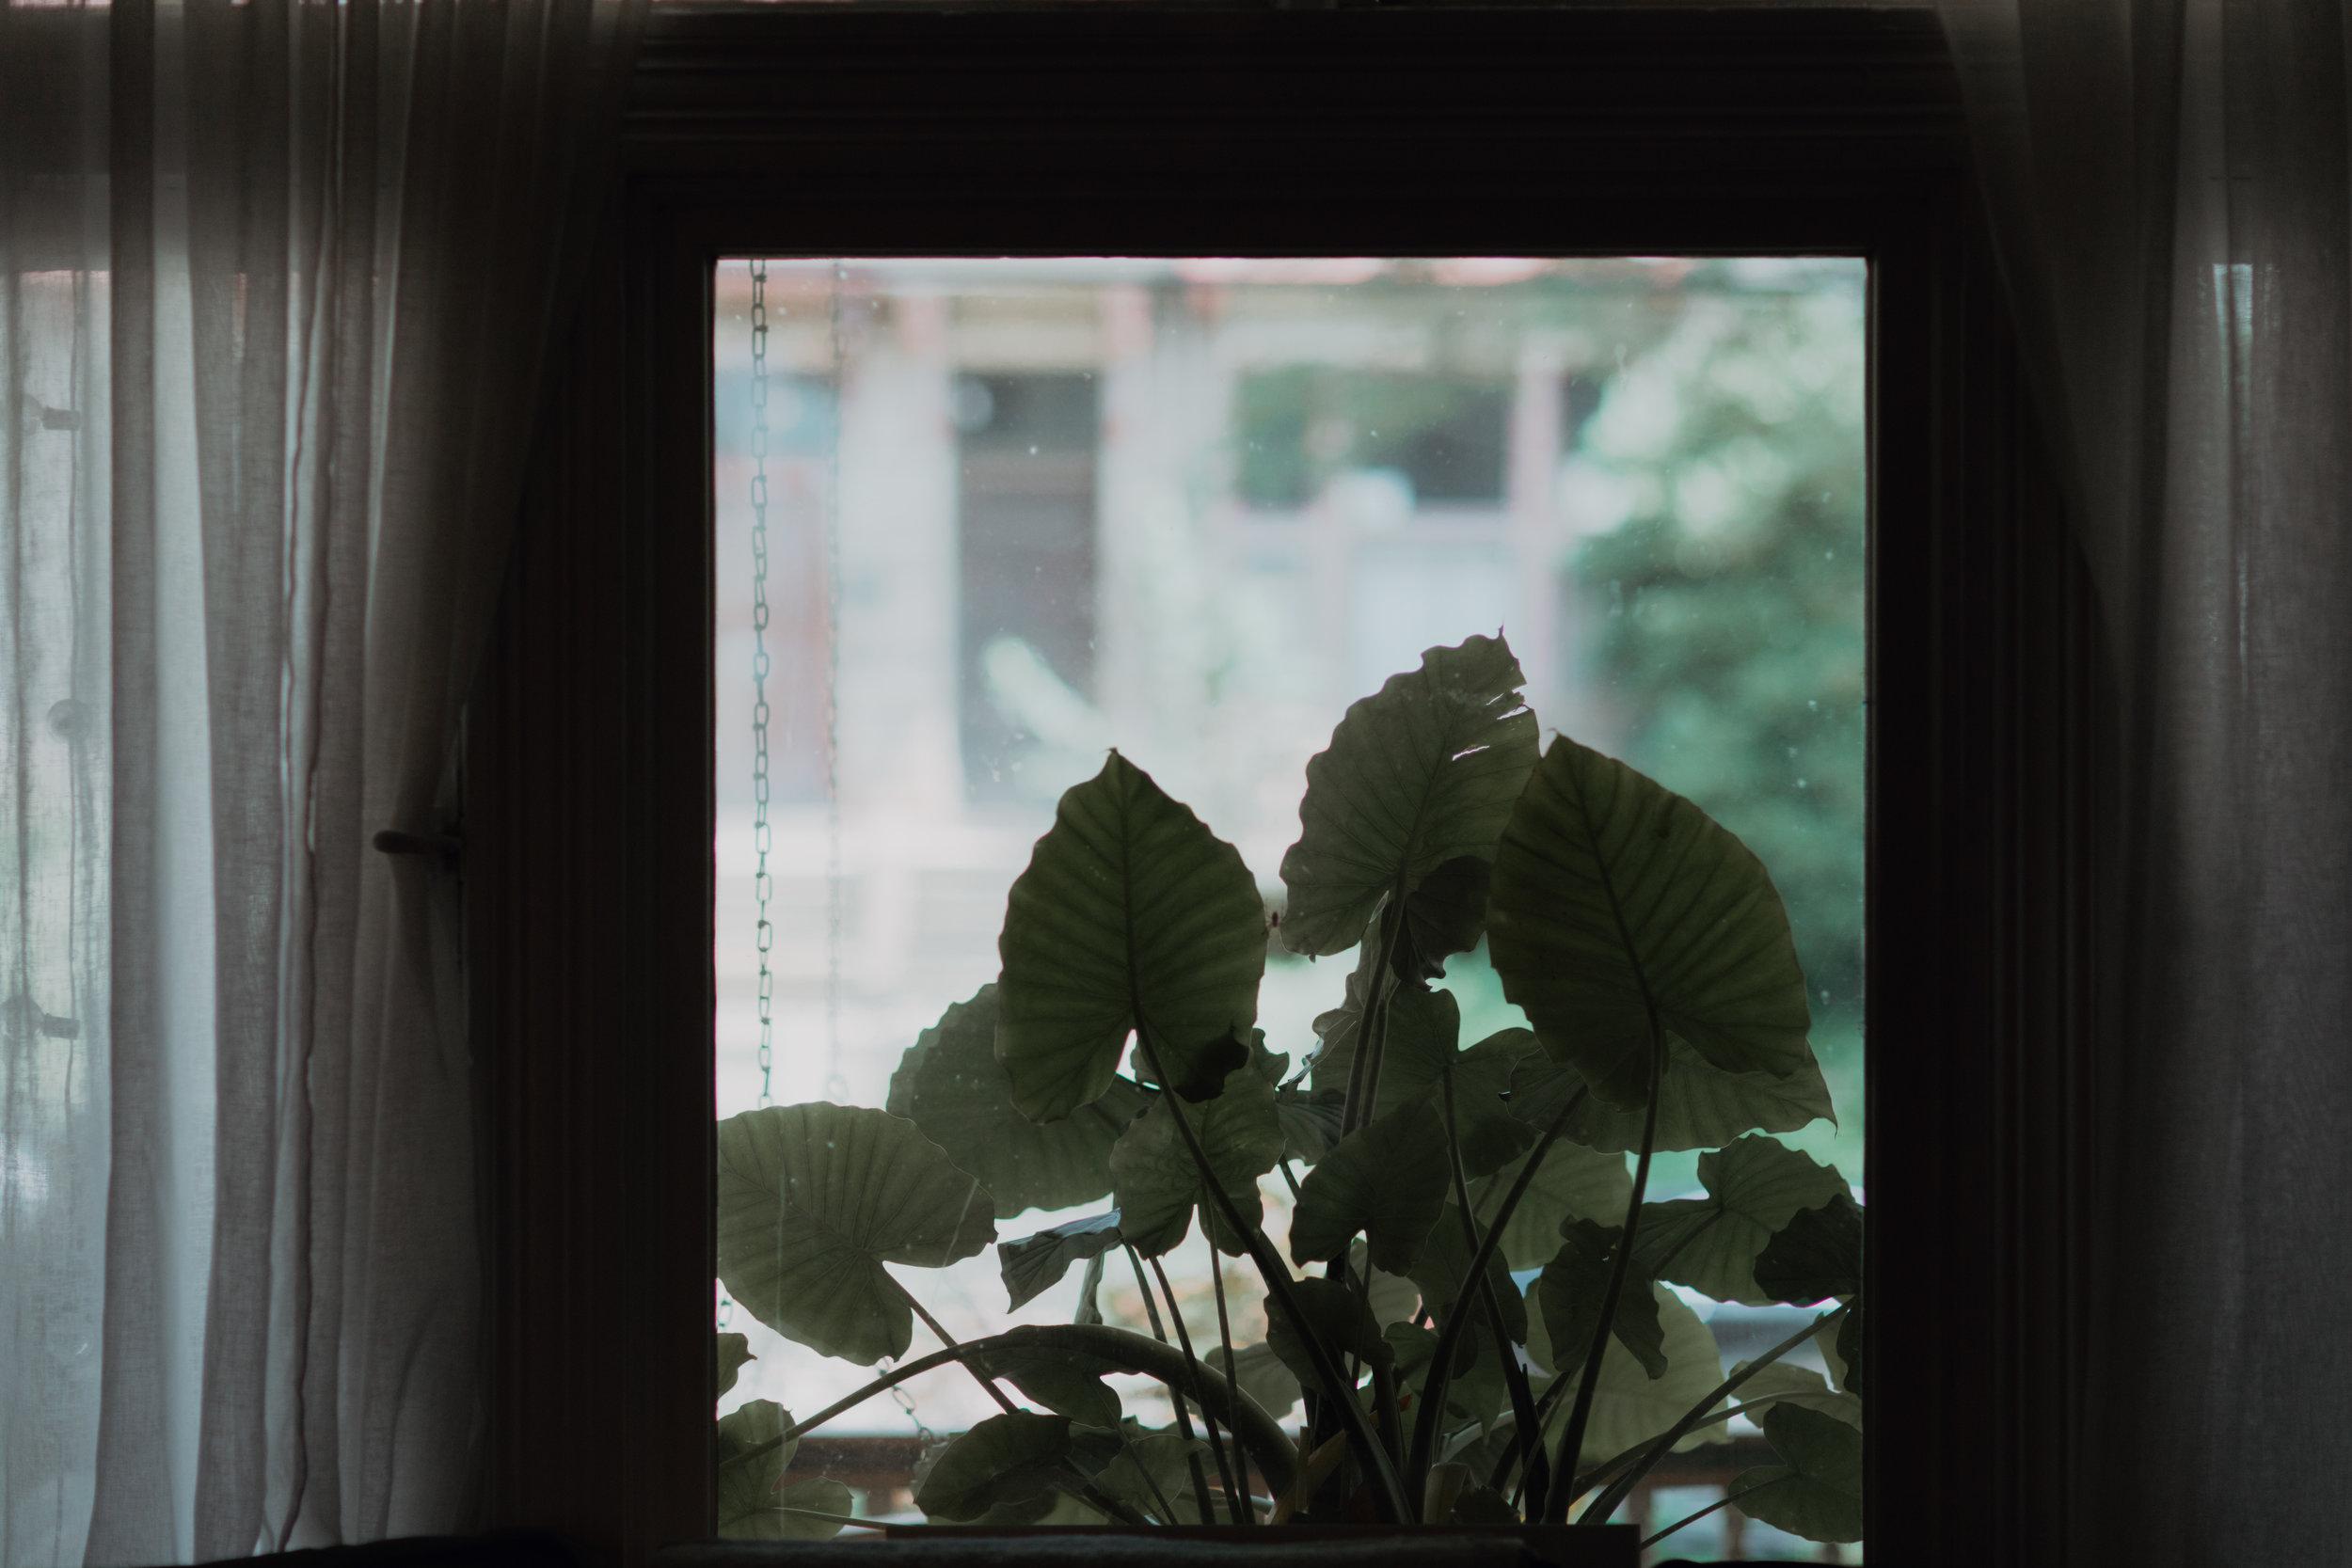 nl_2-3.jpg